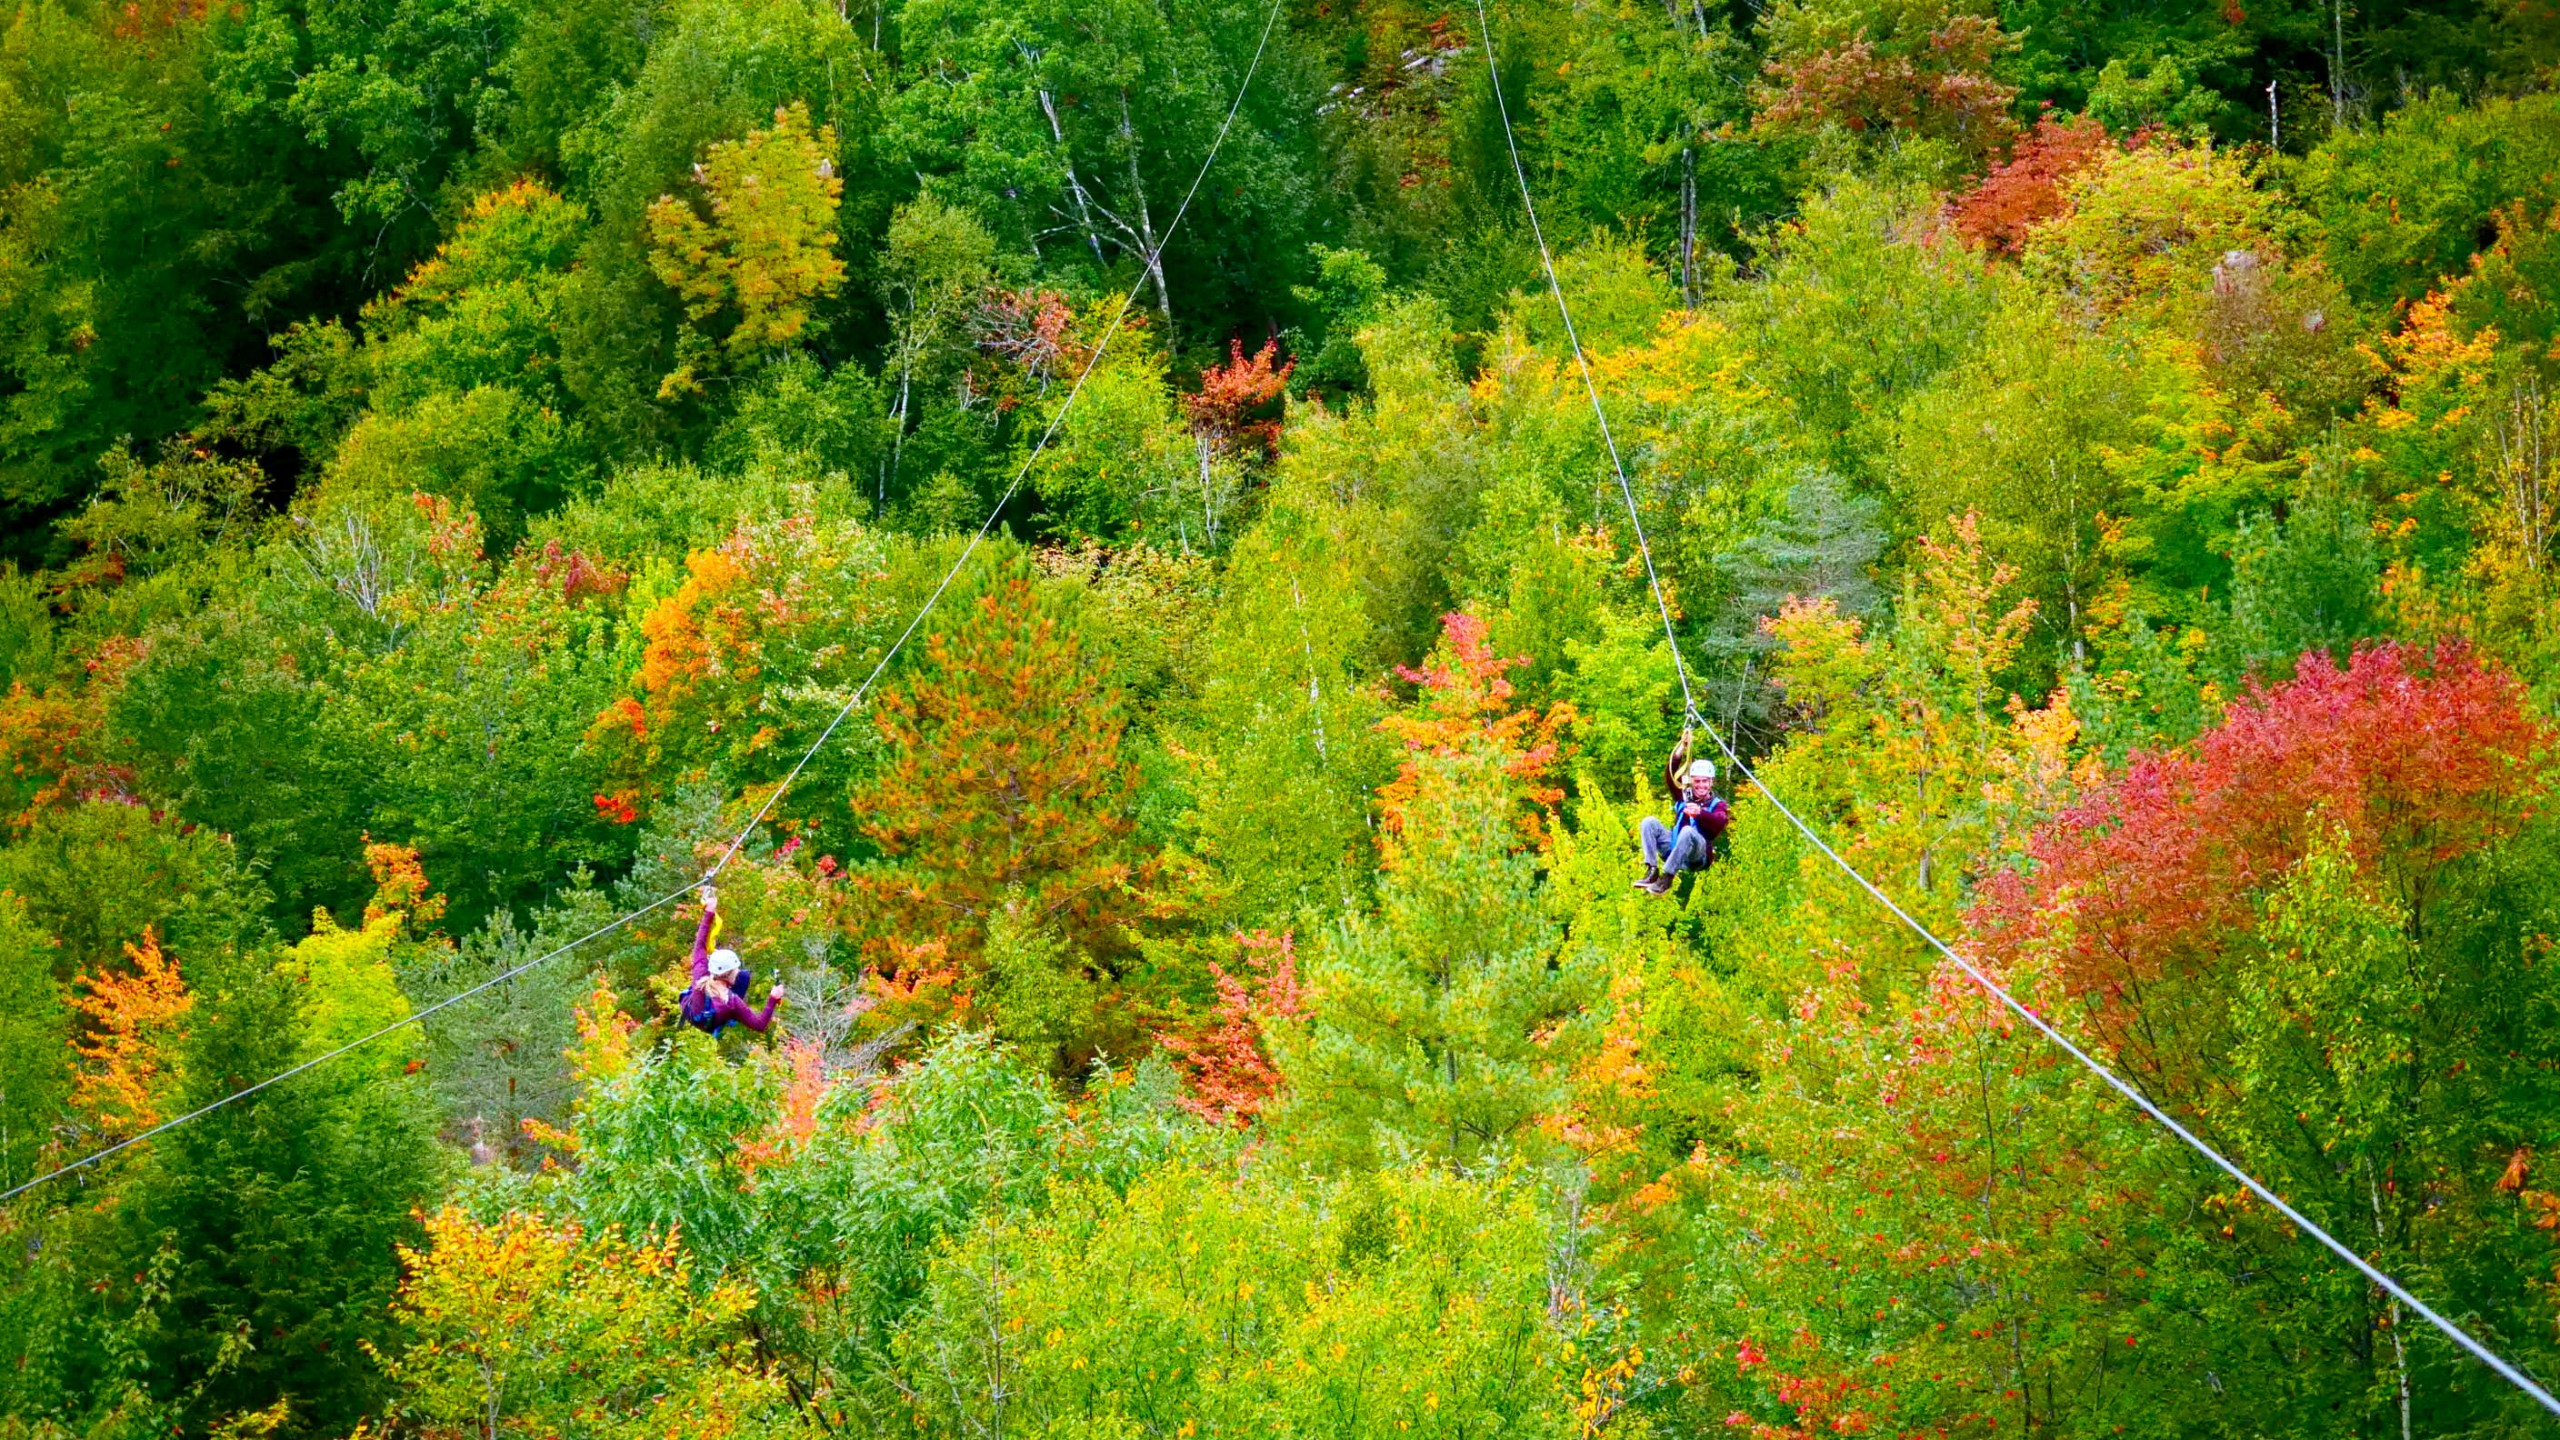 Dual Ziplining Through the Foliage